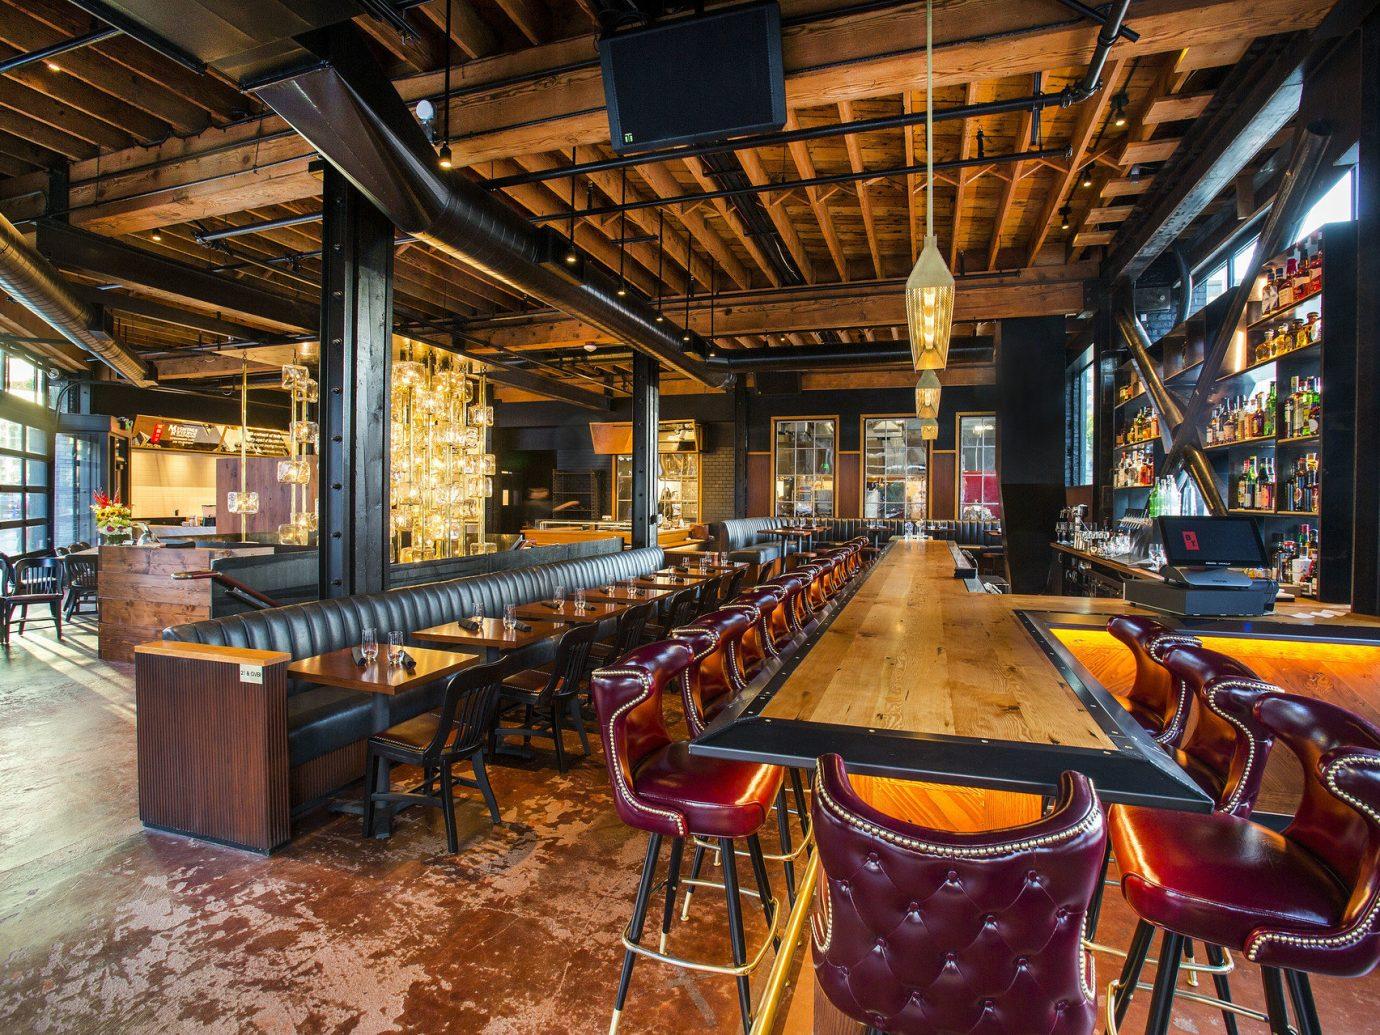 Trip Ideas Weekend Getaways building indoor floor ceiling station estate restaurant interior design Bar Lobby dining room